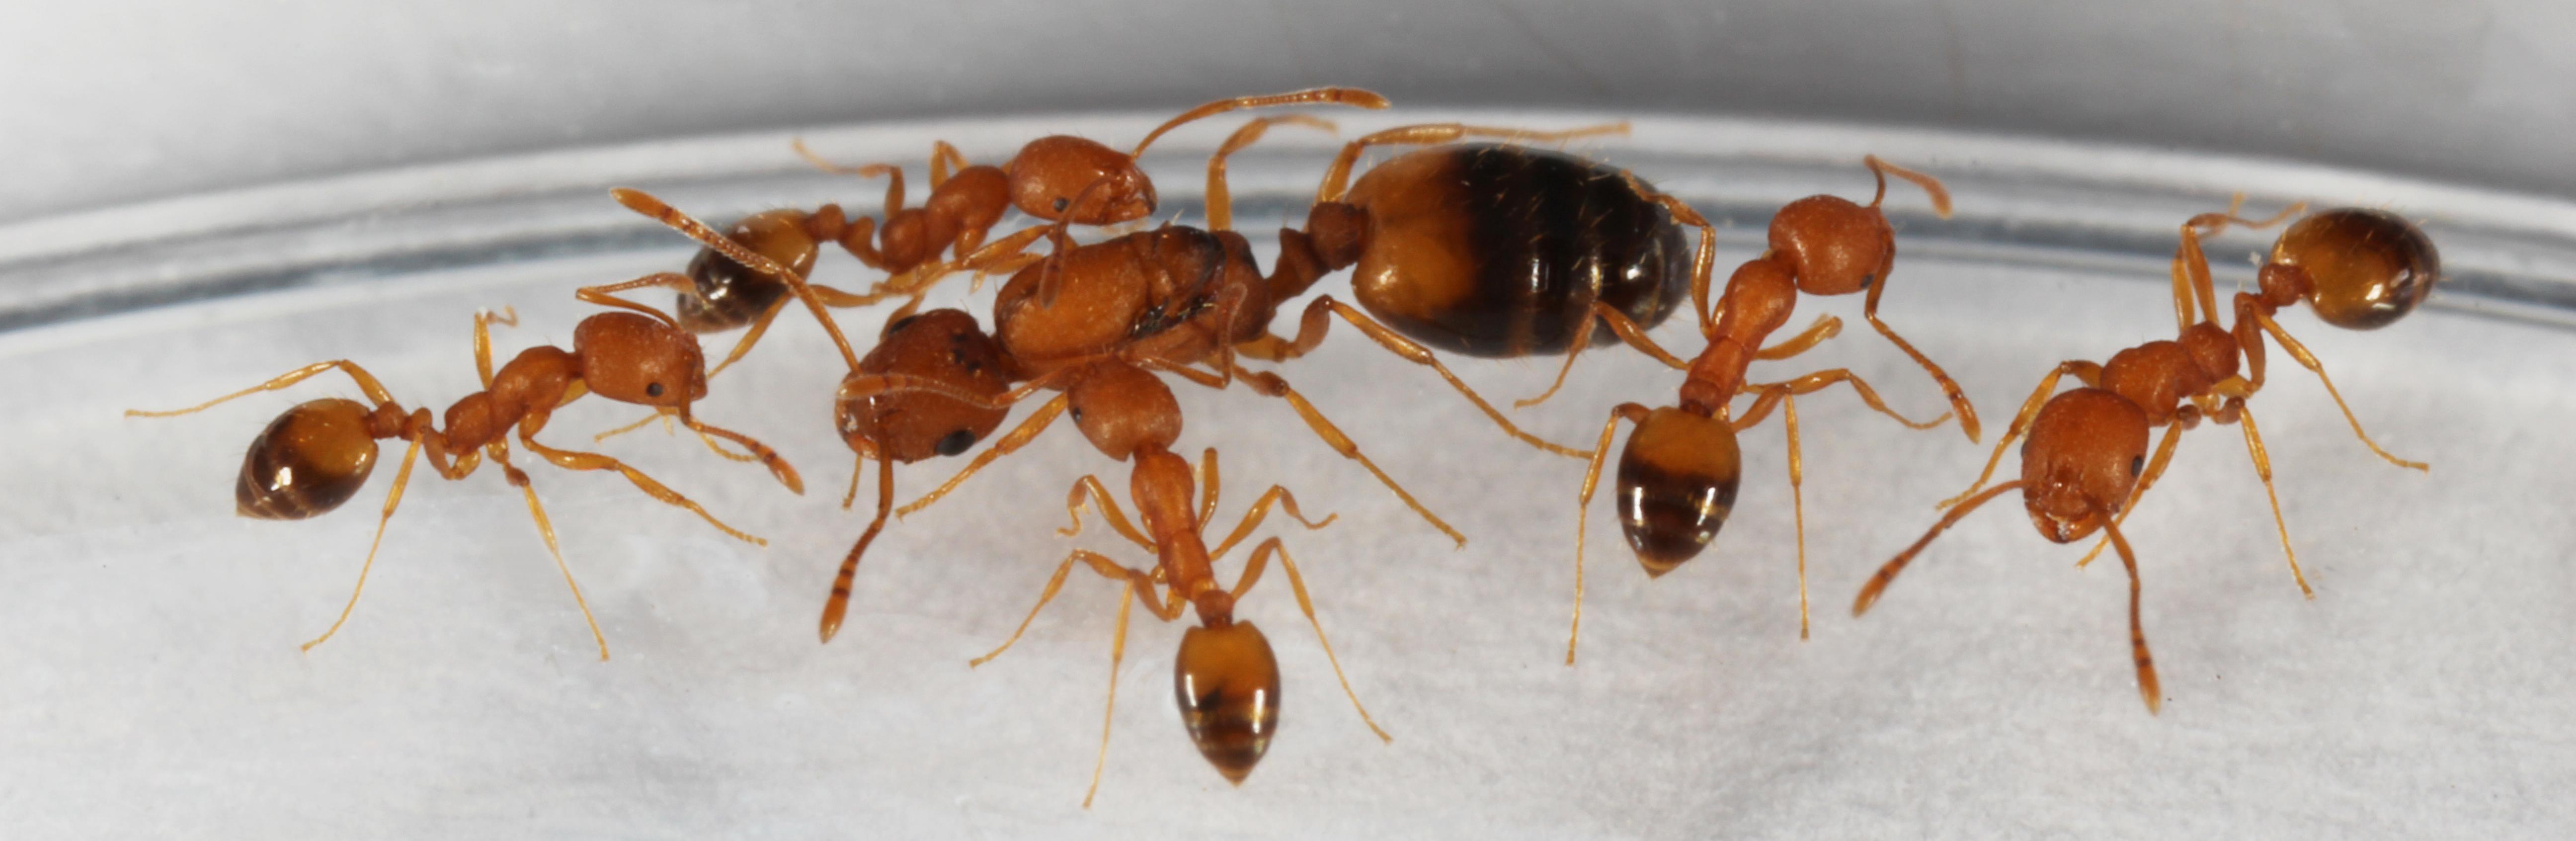 Pharaoh Ant (Monomorium pharaonis)